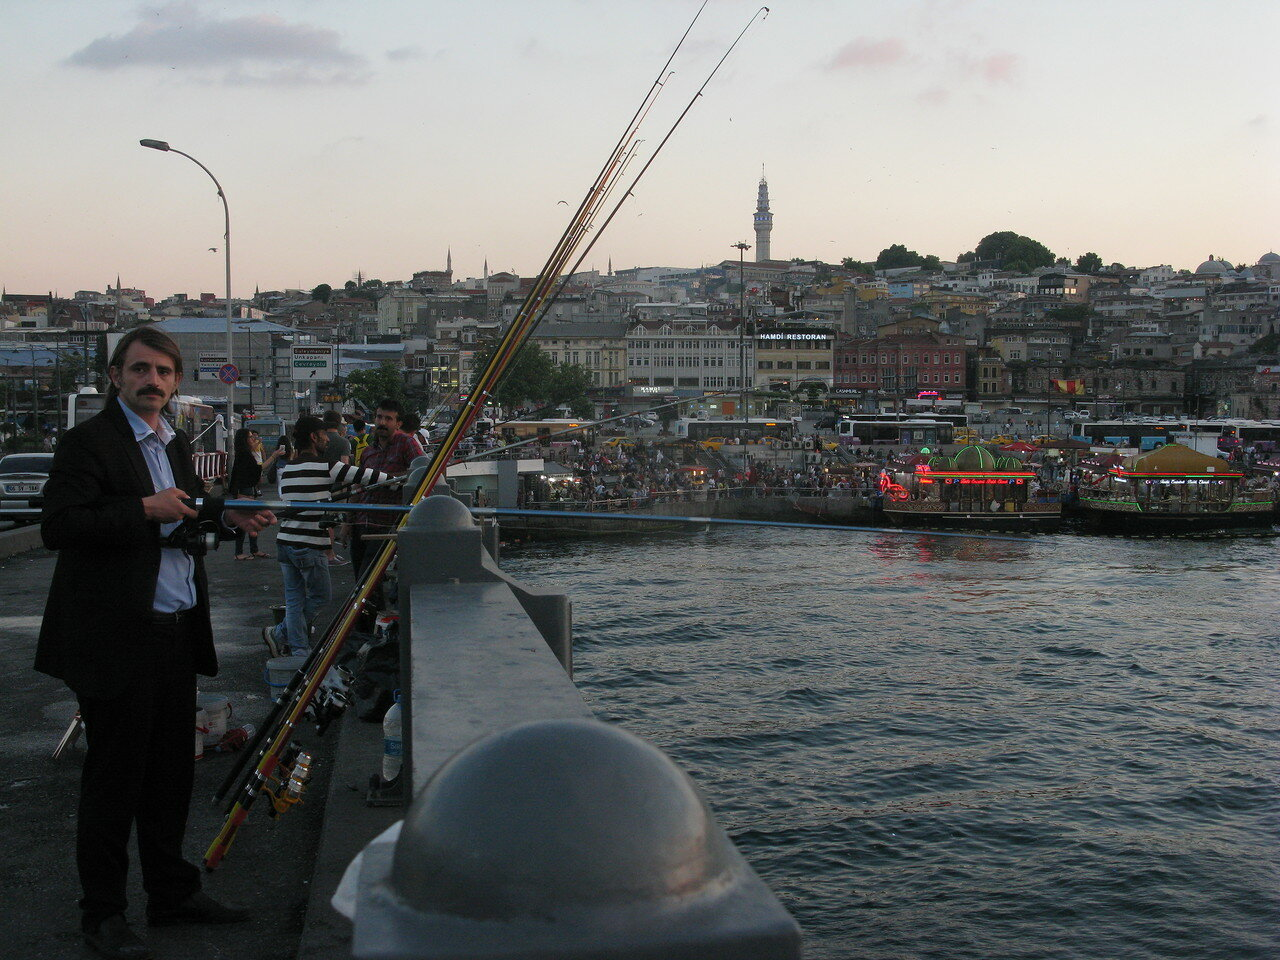 Рыбалка в Стамбуле. Автор фото: Станислав Кривошеев